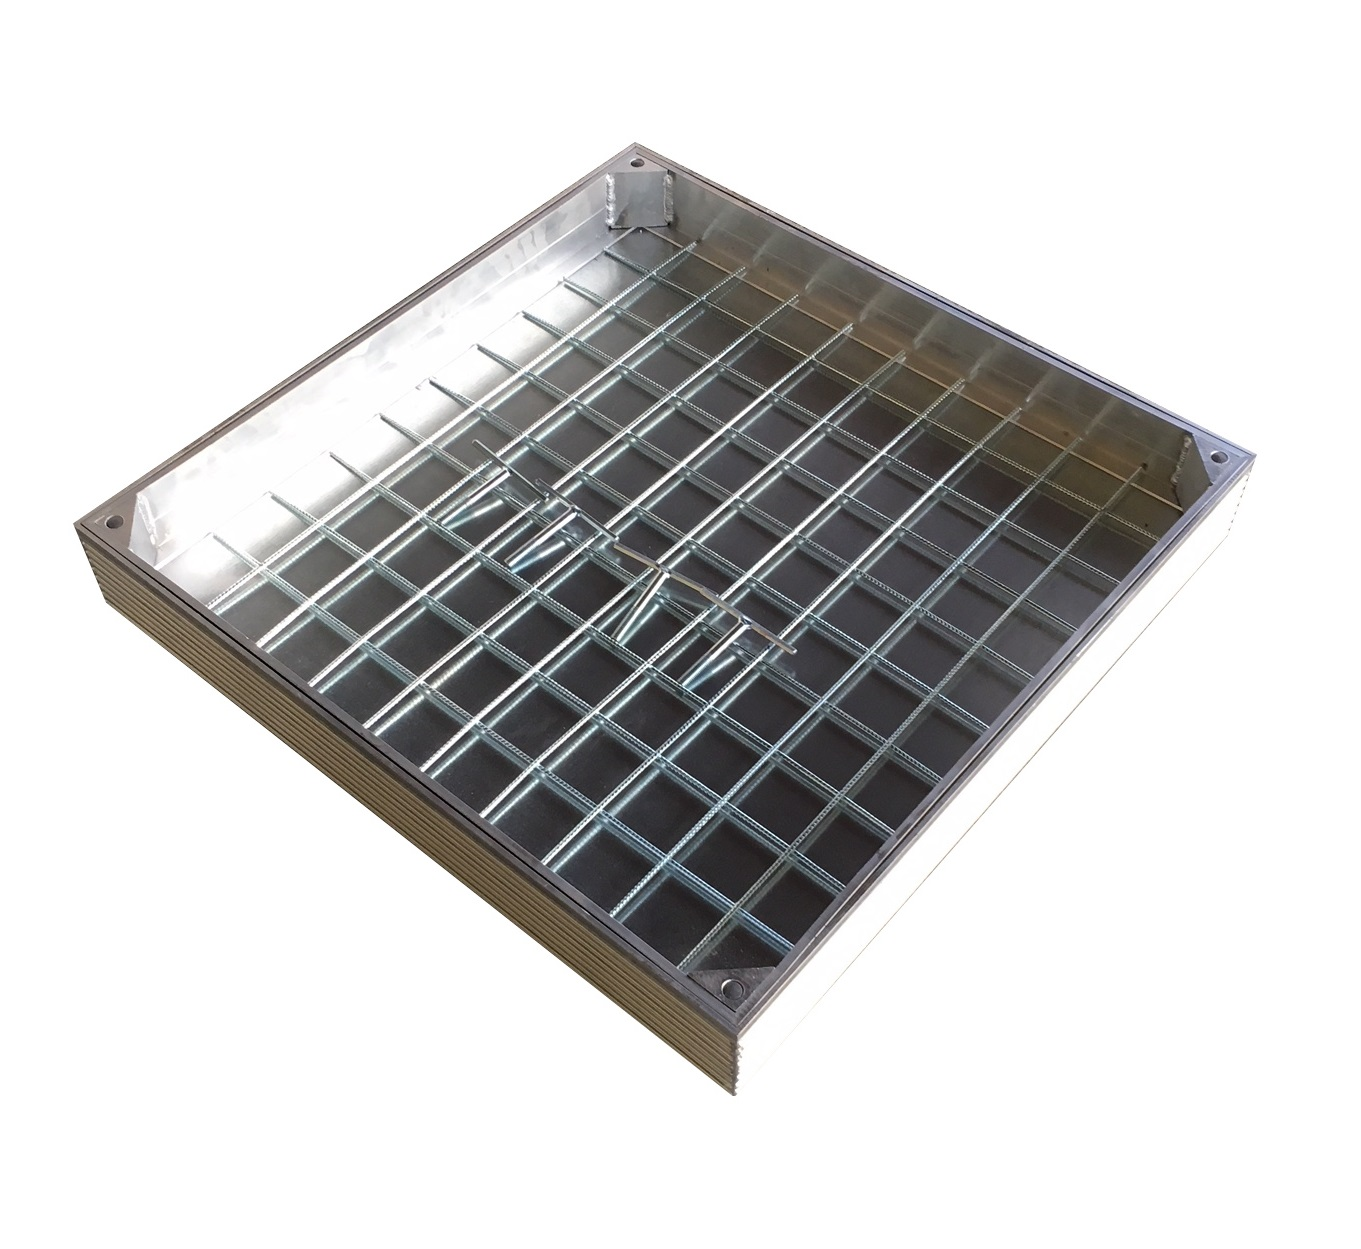 TROBAK - Schachtdeckel Aluminium auspflasterbar 70 x 70 cm PKW befahrbar